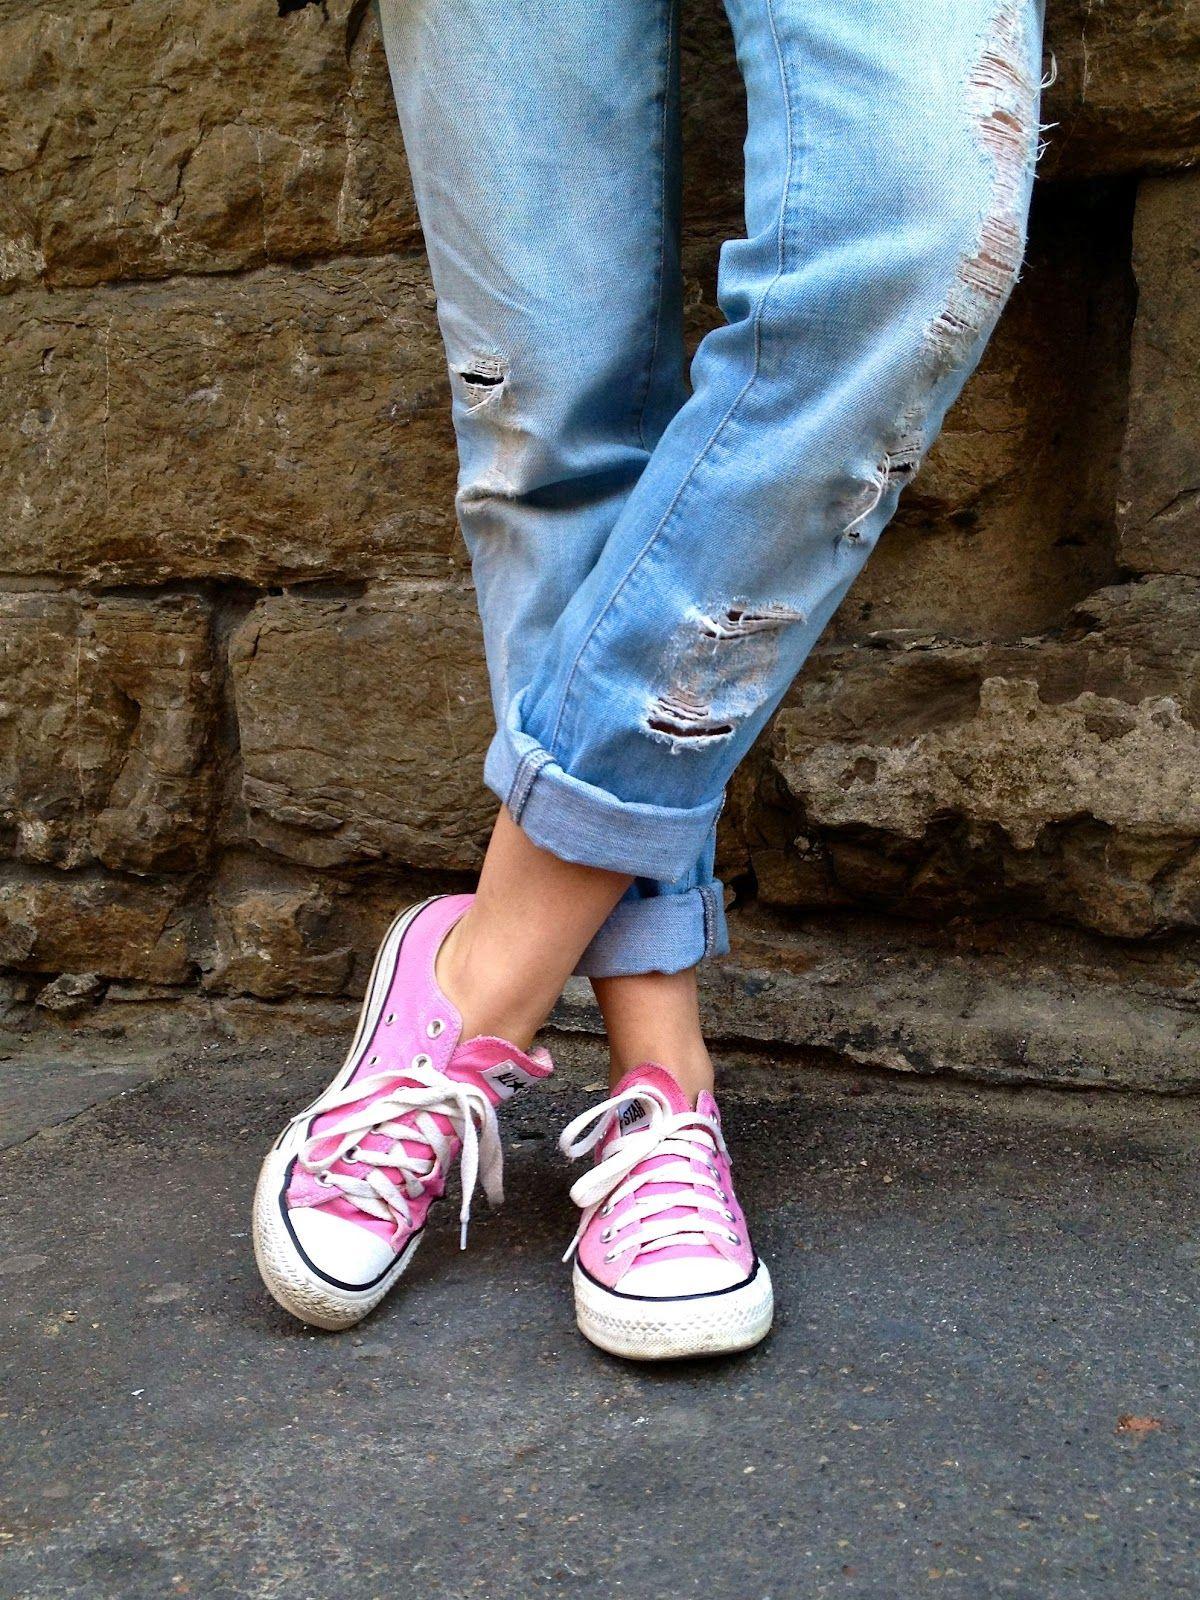 d69ba6a88715 Pink converse   distressed boyfrien jeans